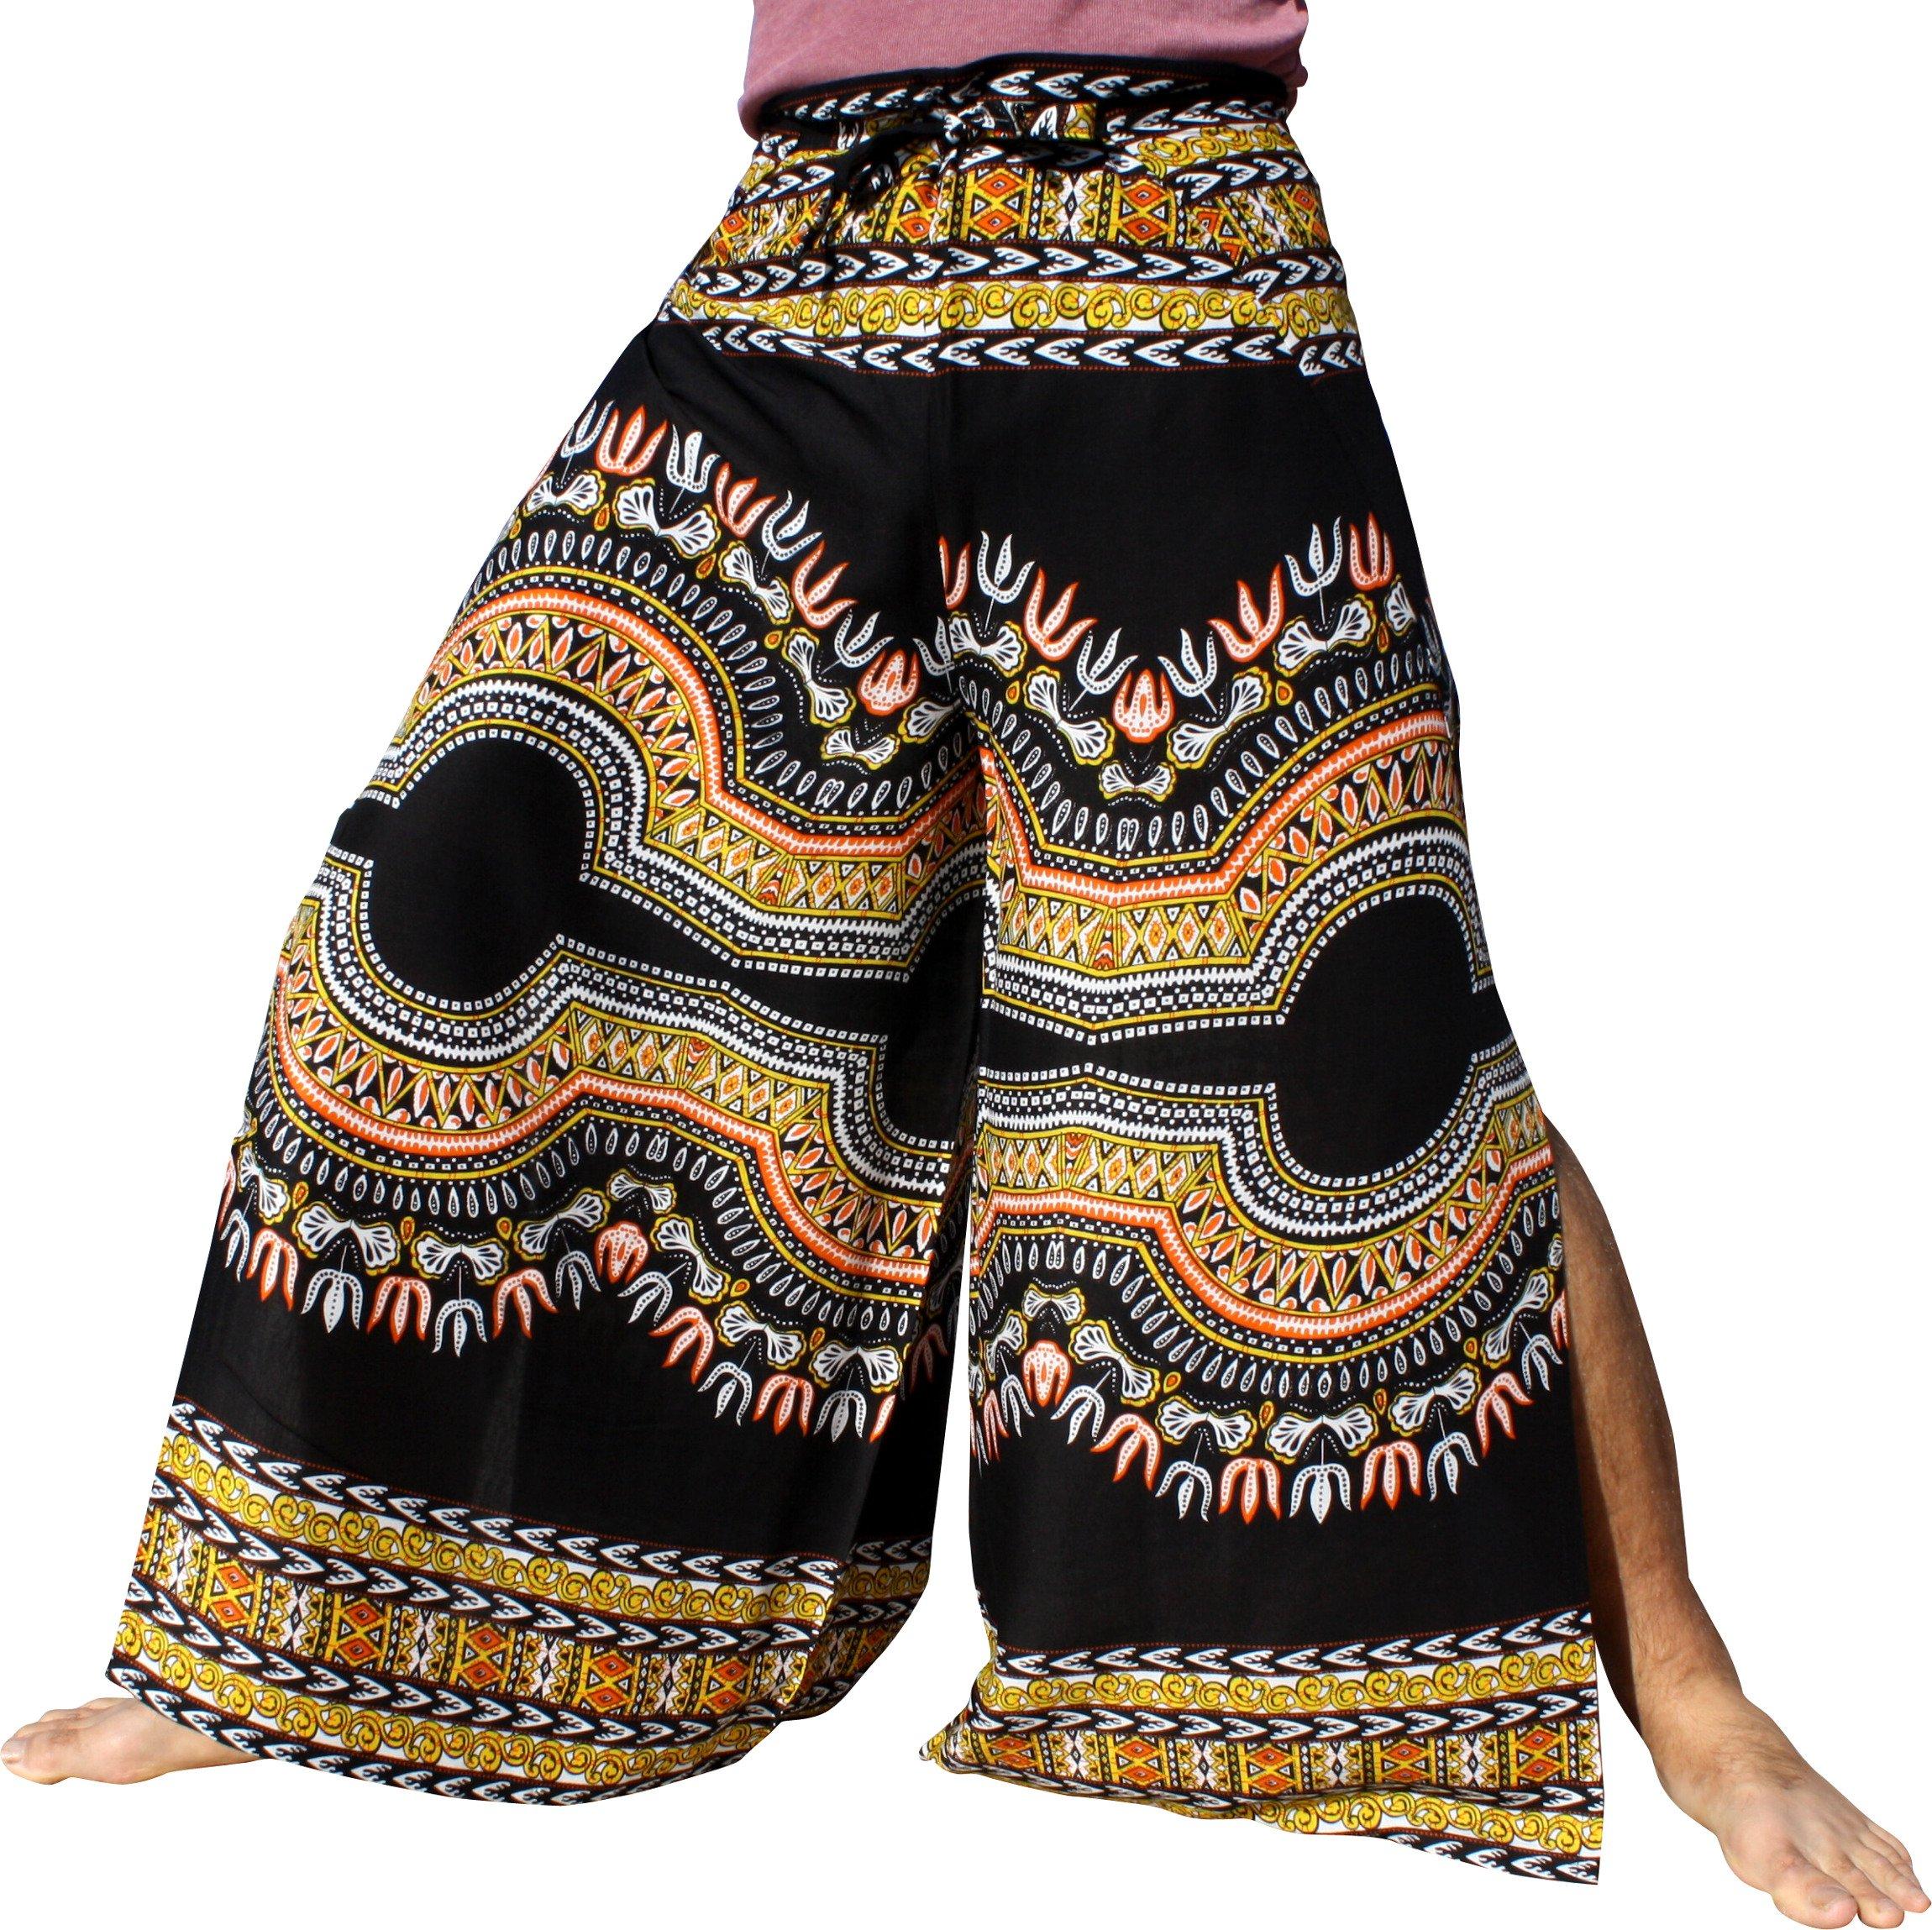 Raan Pah Muang Silky Rayon Drive In Wrap Pants Light African Dashiki Art Viscose, Medium, Black